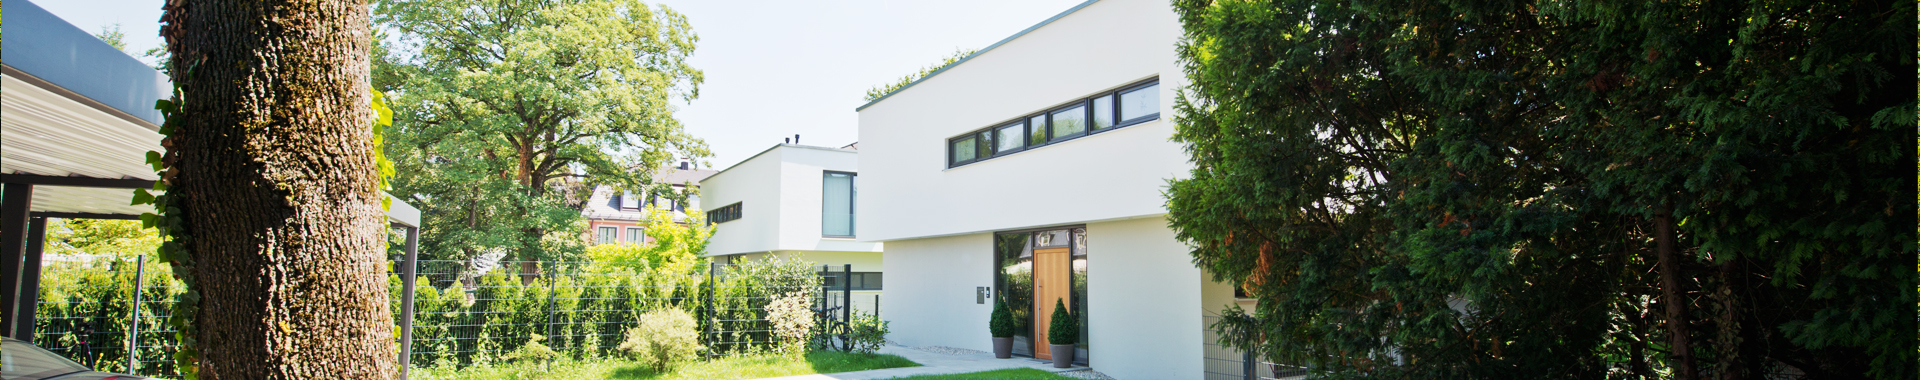 Kellhuber GmbH - Bauunternehmen Eggenfelden